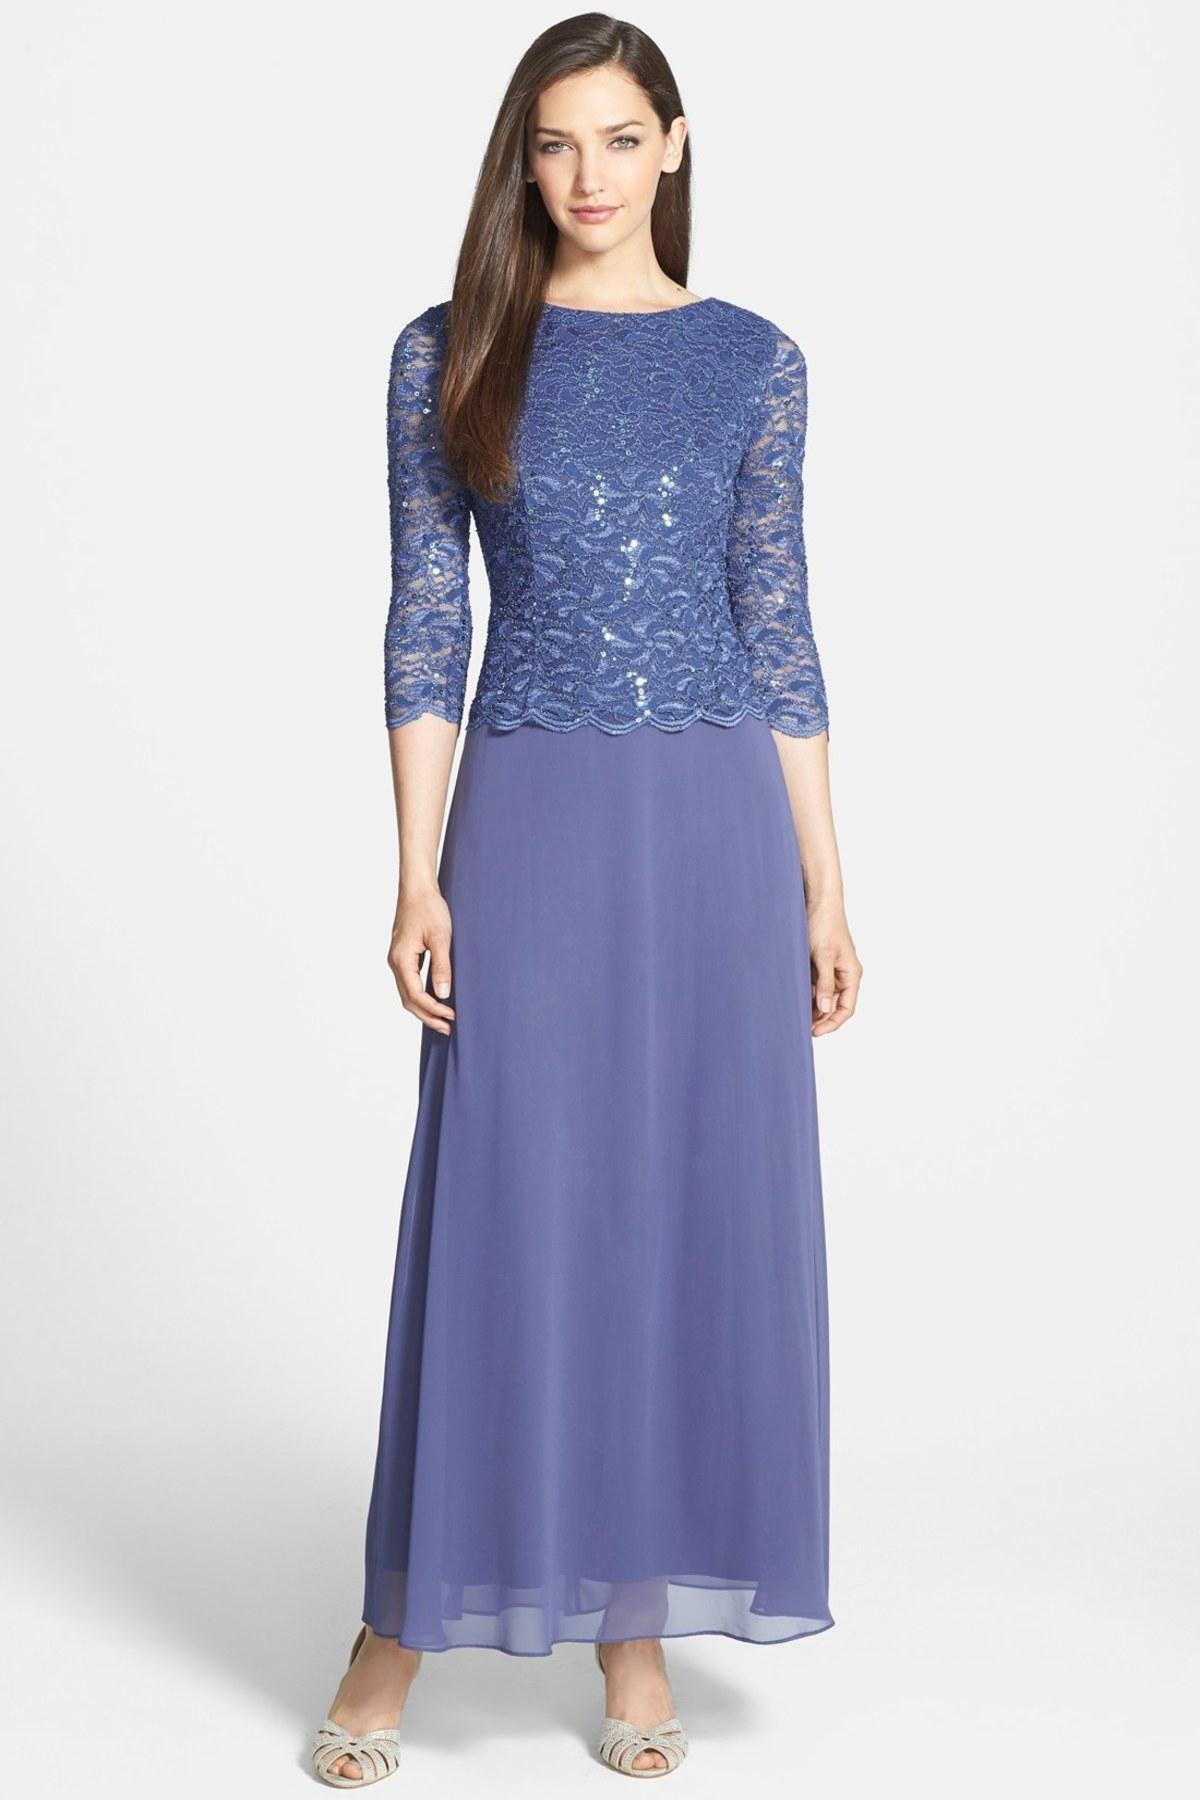 alex evenings mock two piece dress petite in blue lyst. Black Bedroom Furniture Sets. Home Design Ideas